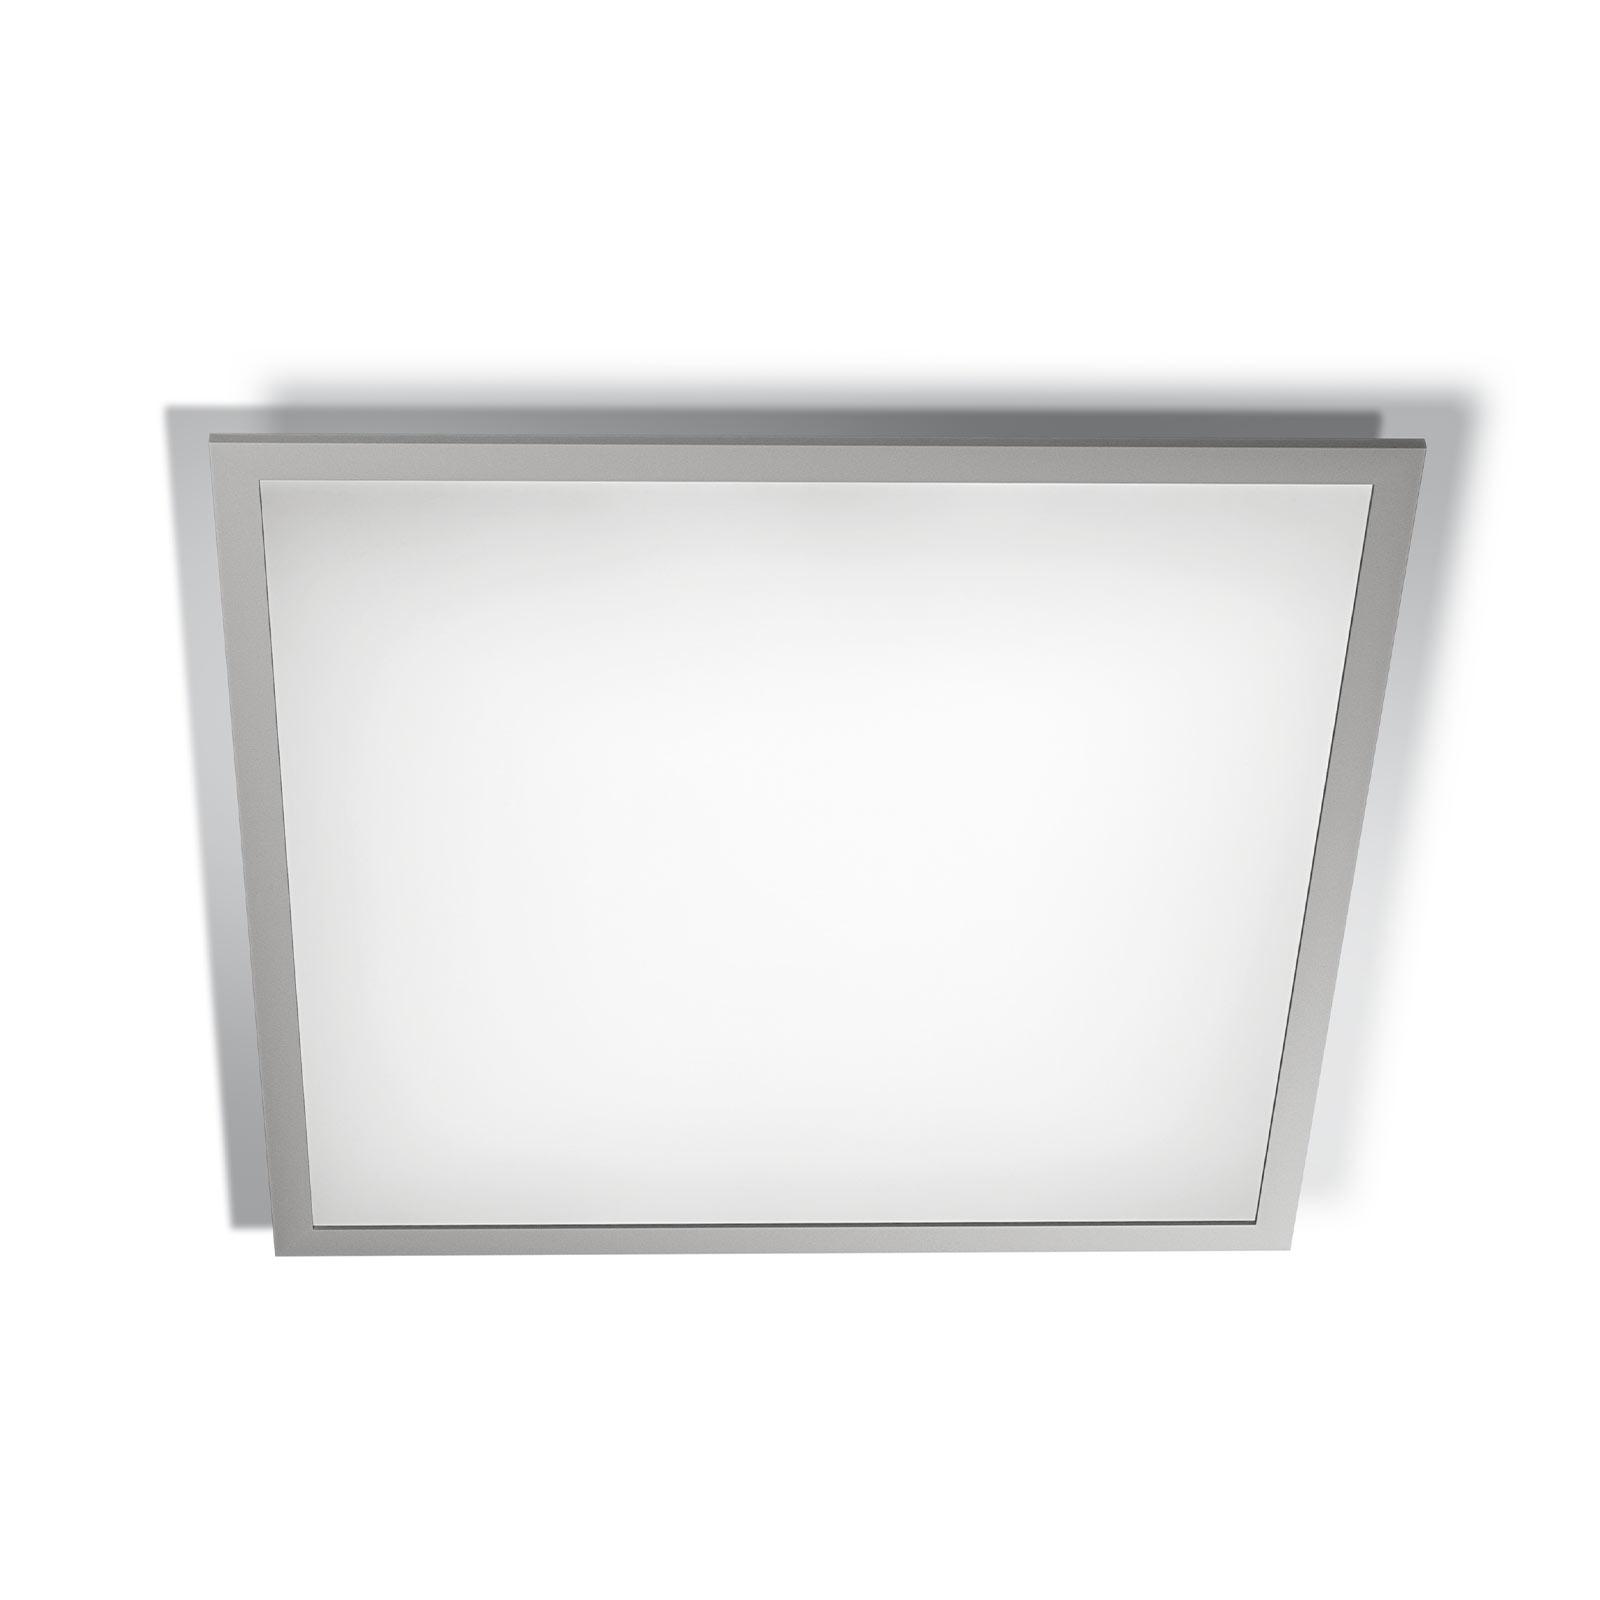 LEDVANCE Planon Plus LED-Panel 60x60cm 830 36W